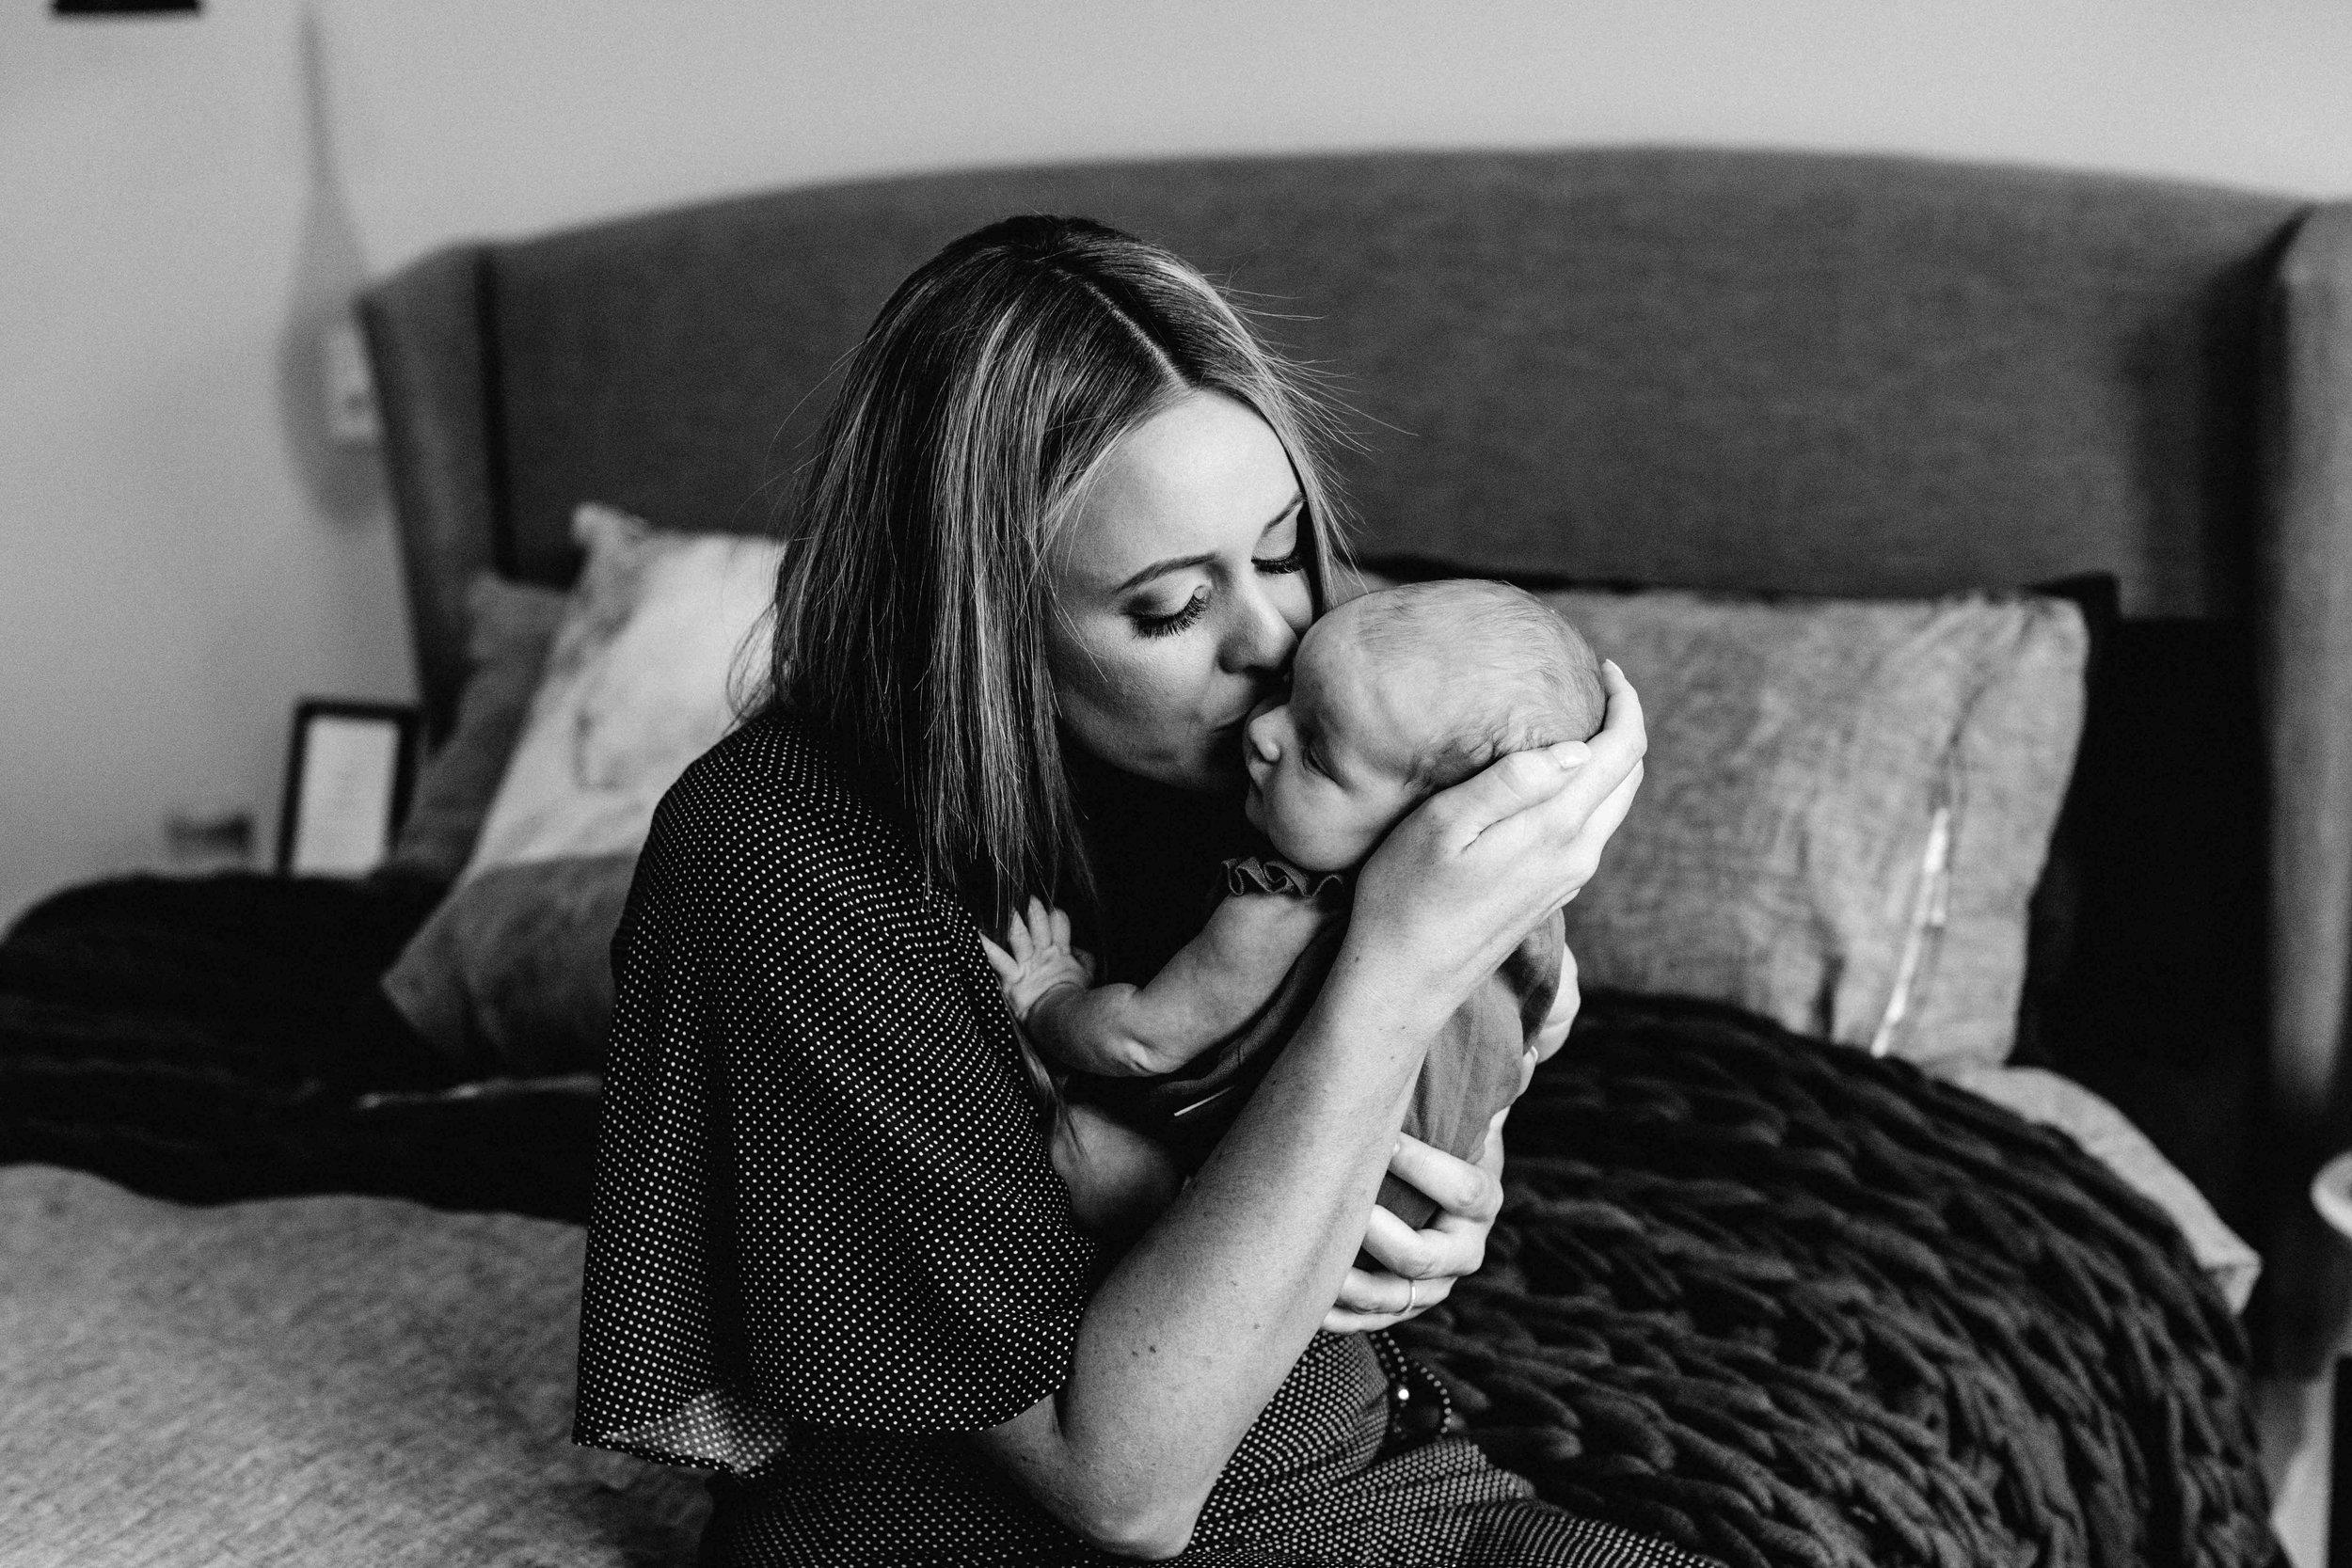 picton-newborn-photography-www.emilyobrienphotography.net-macarthur-wollondilly-arlo-7.jpg